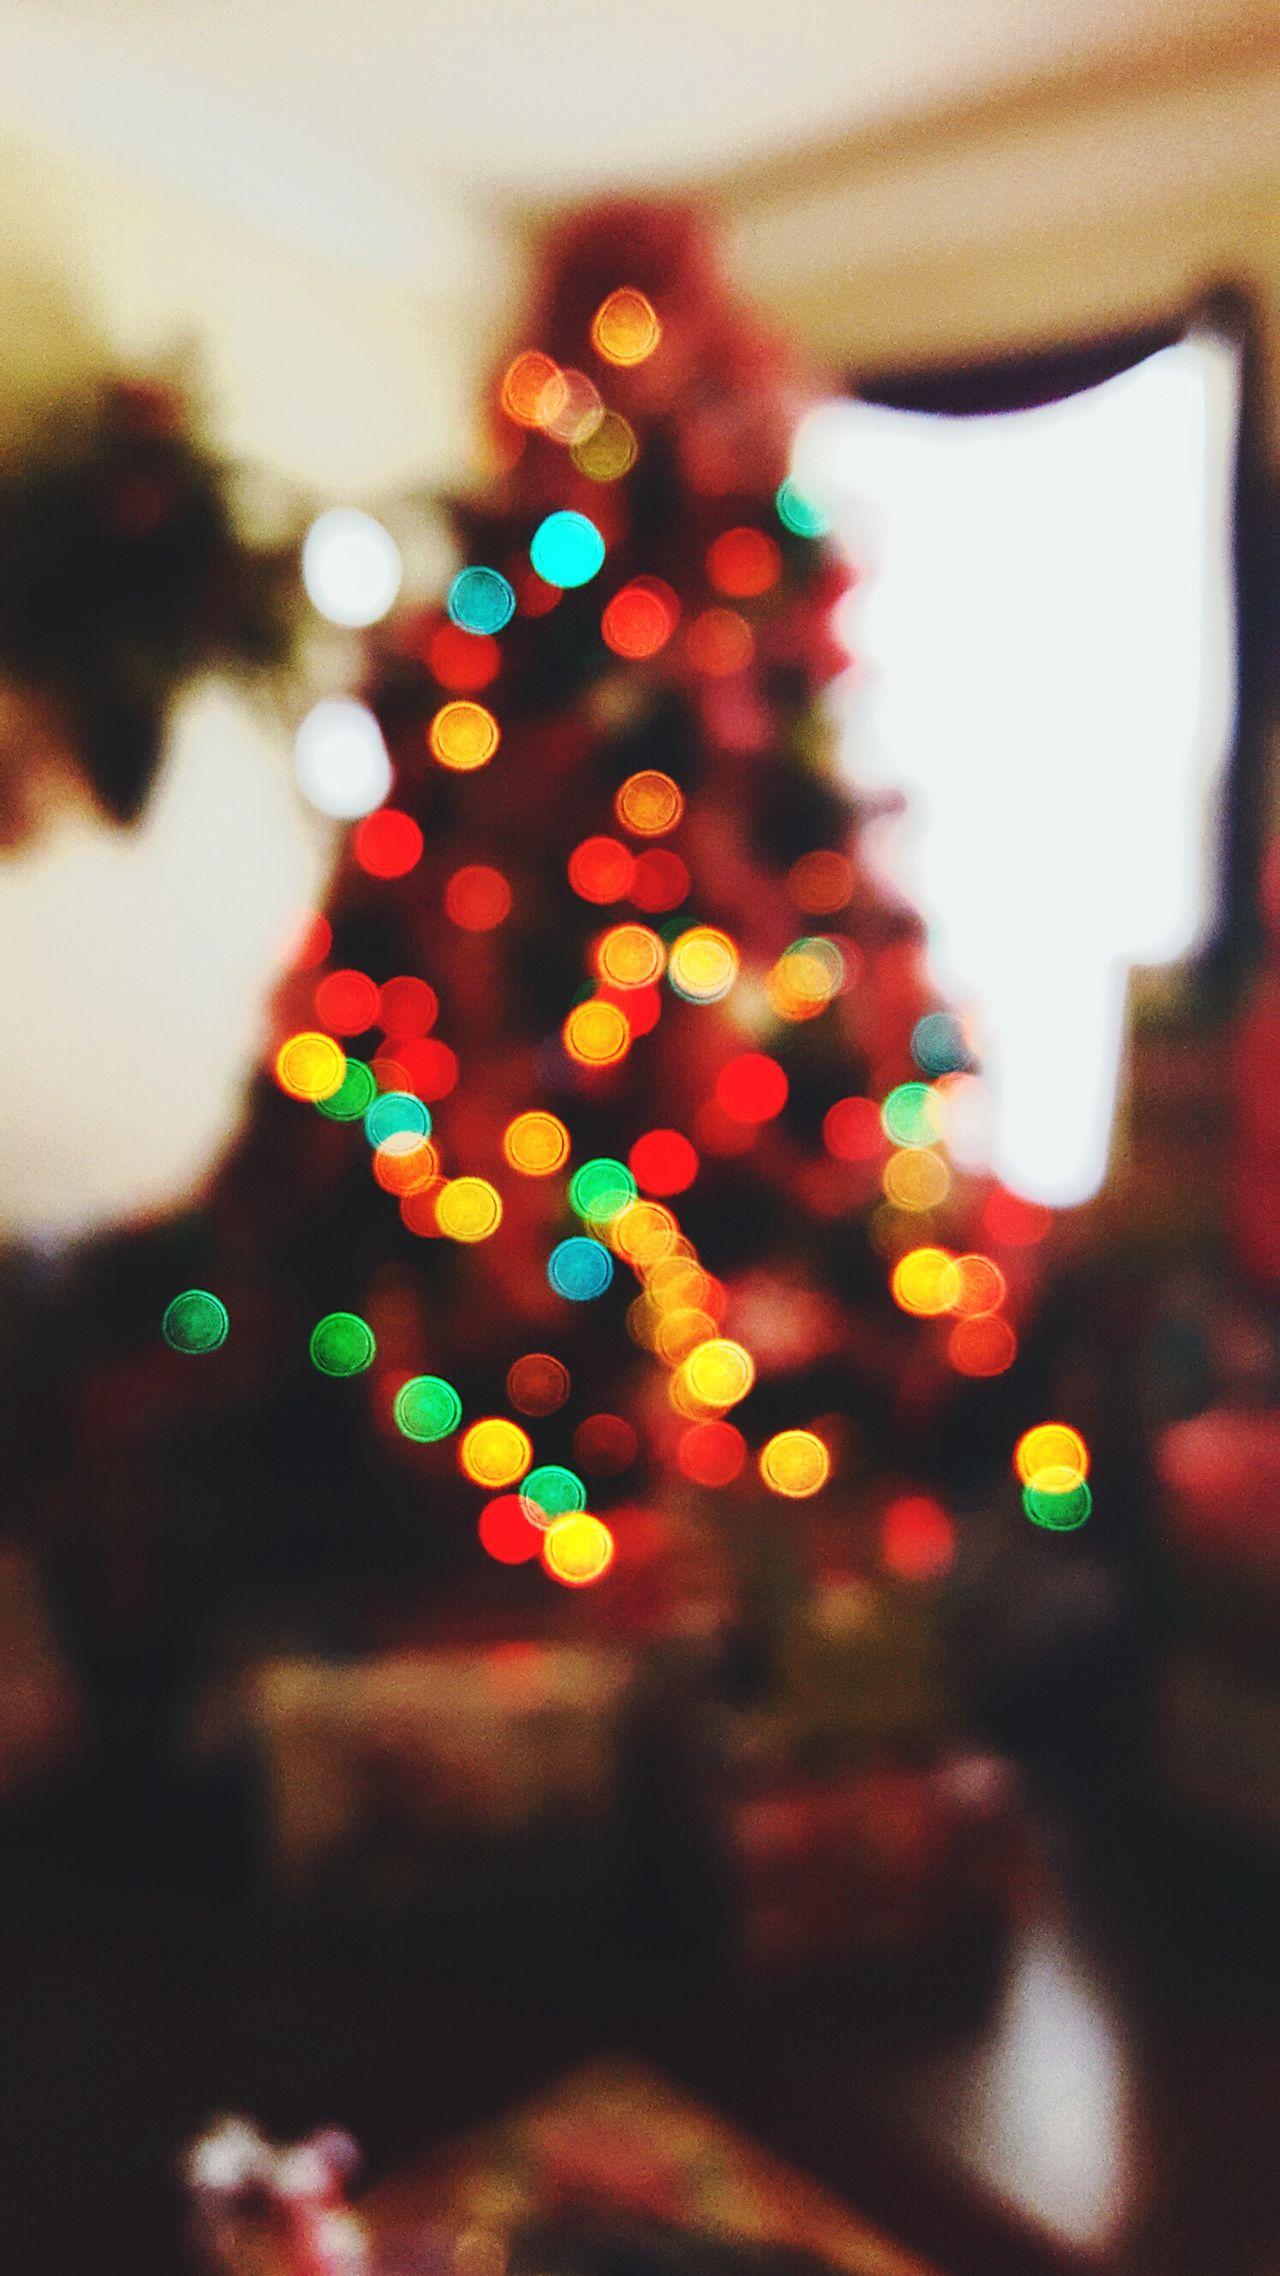 Christmas tree 💕🎊 Christmas Christmas Tree Defocused Celebration Christmas Lights Illuminated No People Christmas Decoration Tree Multi Colored Christmas Ornament Tradition Bokeh Bokeh Lights Bokeh Photography